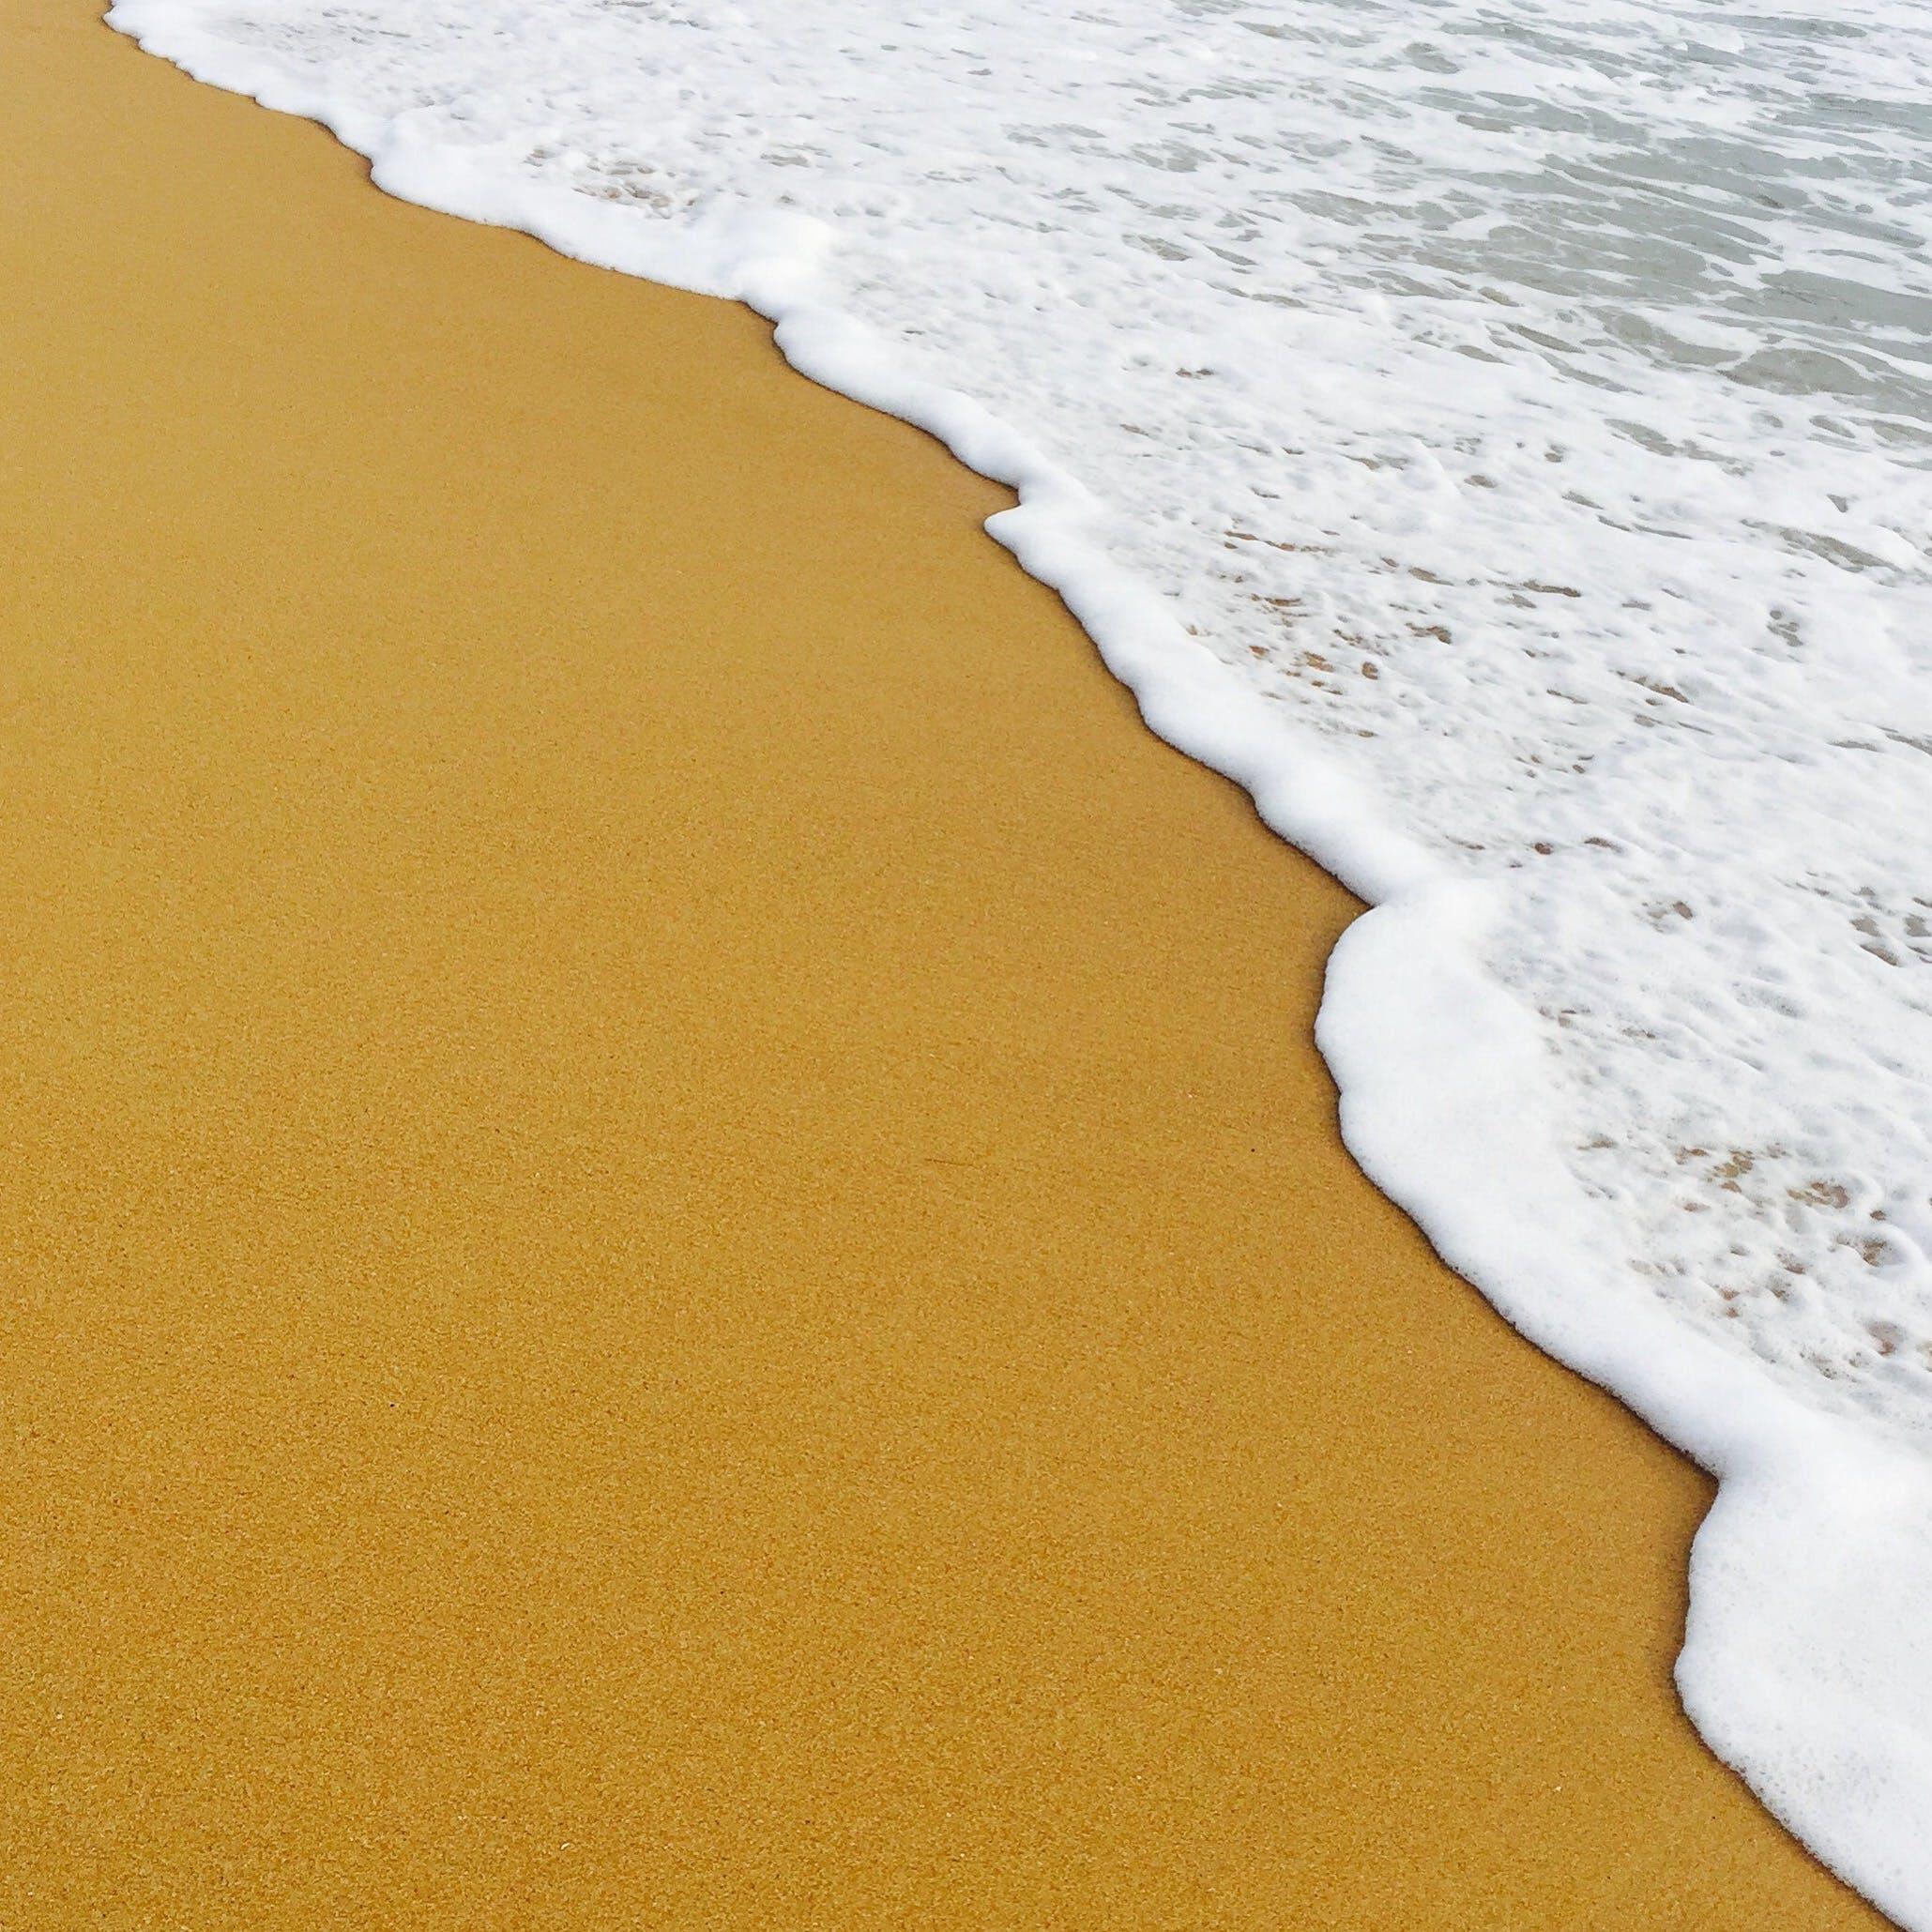 Photos gratuites de bord de mer, eau, gros plan, marée